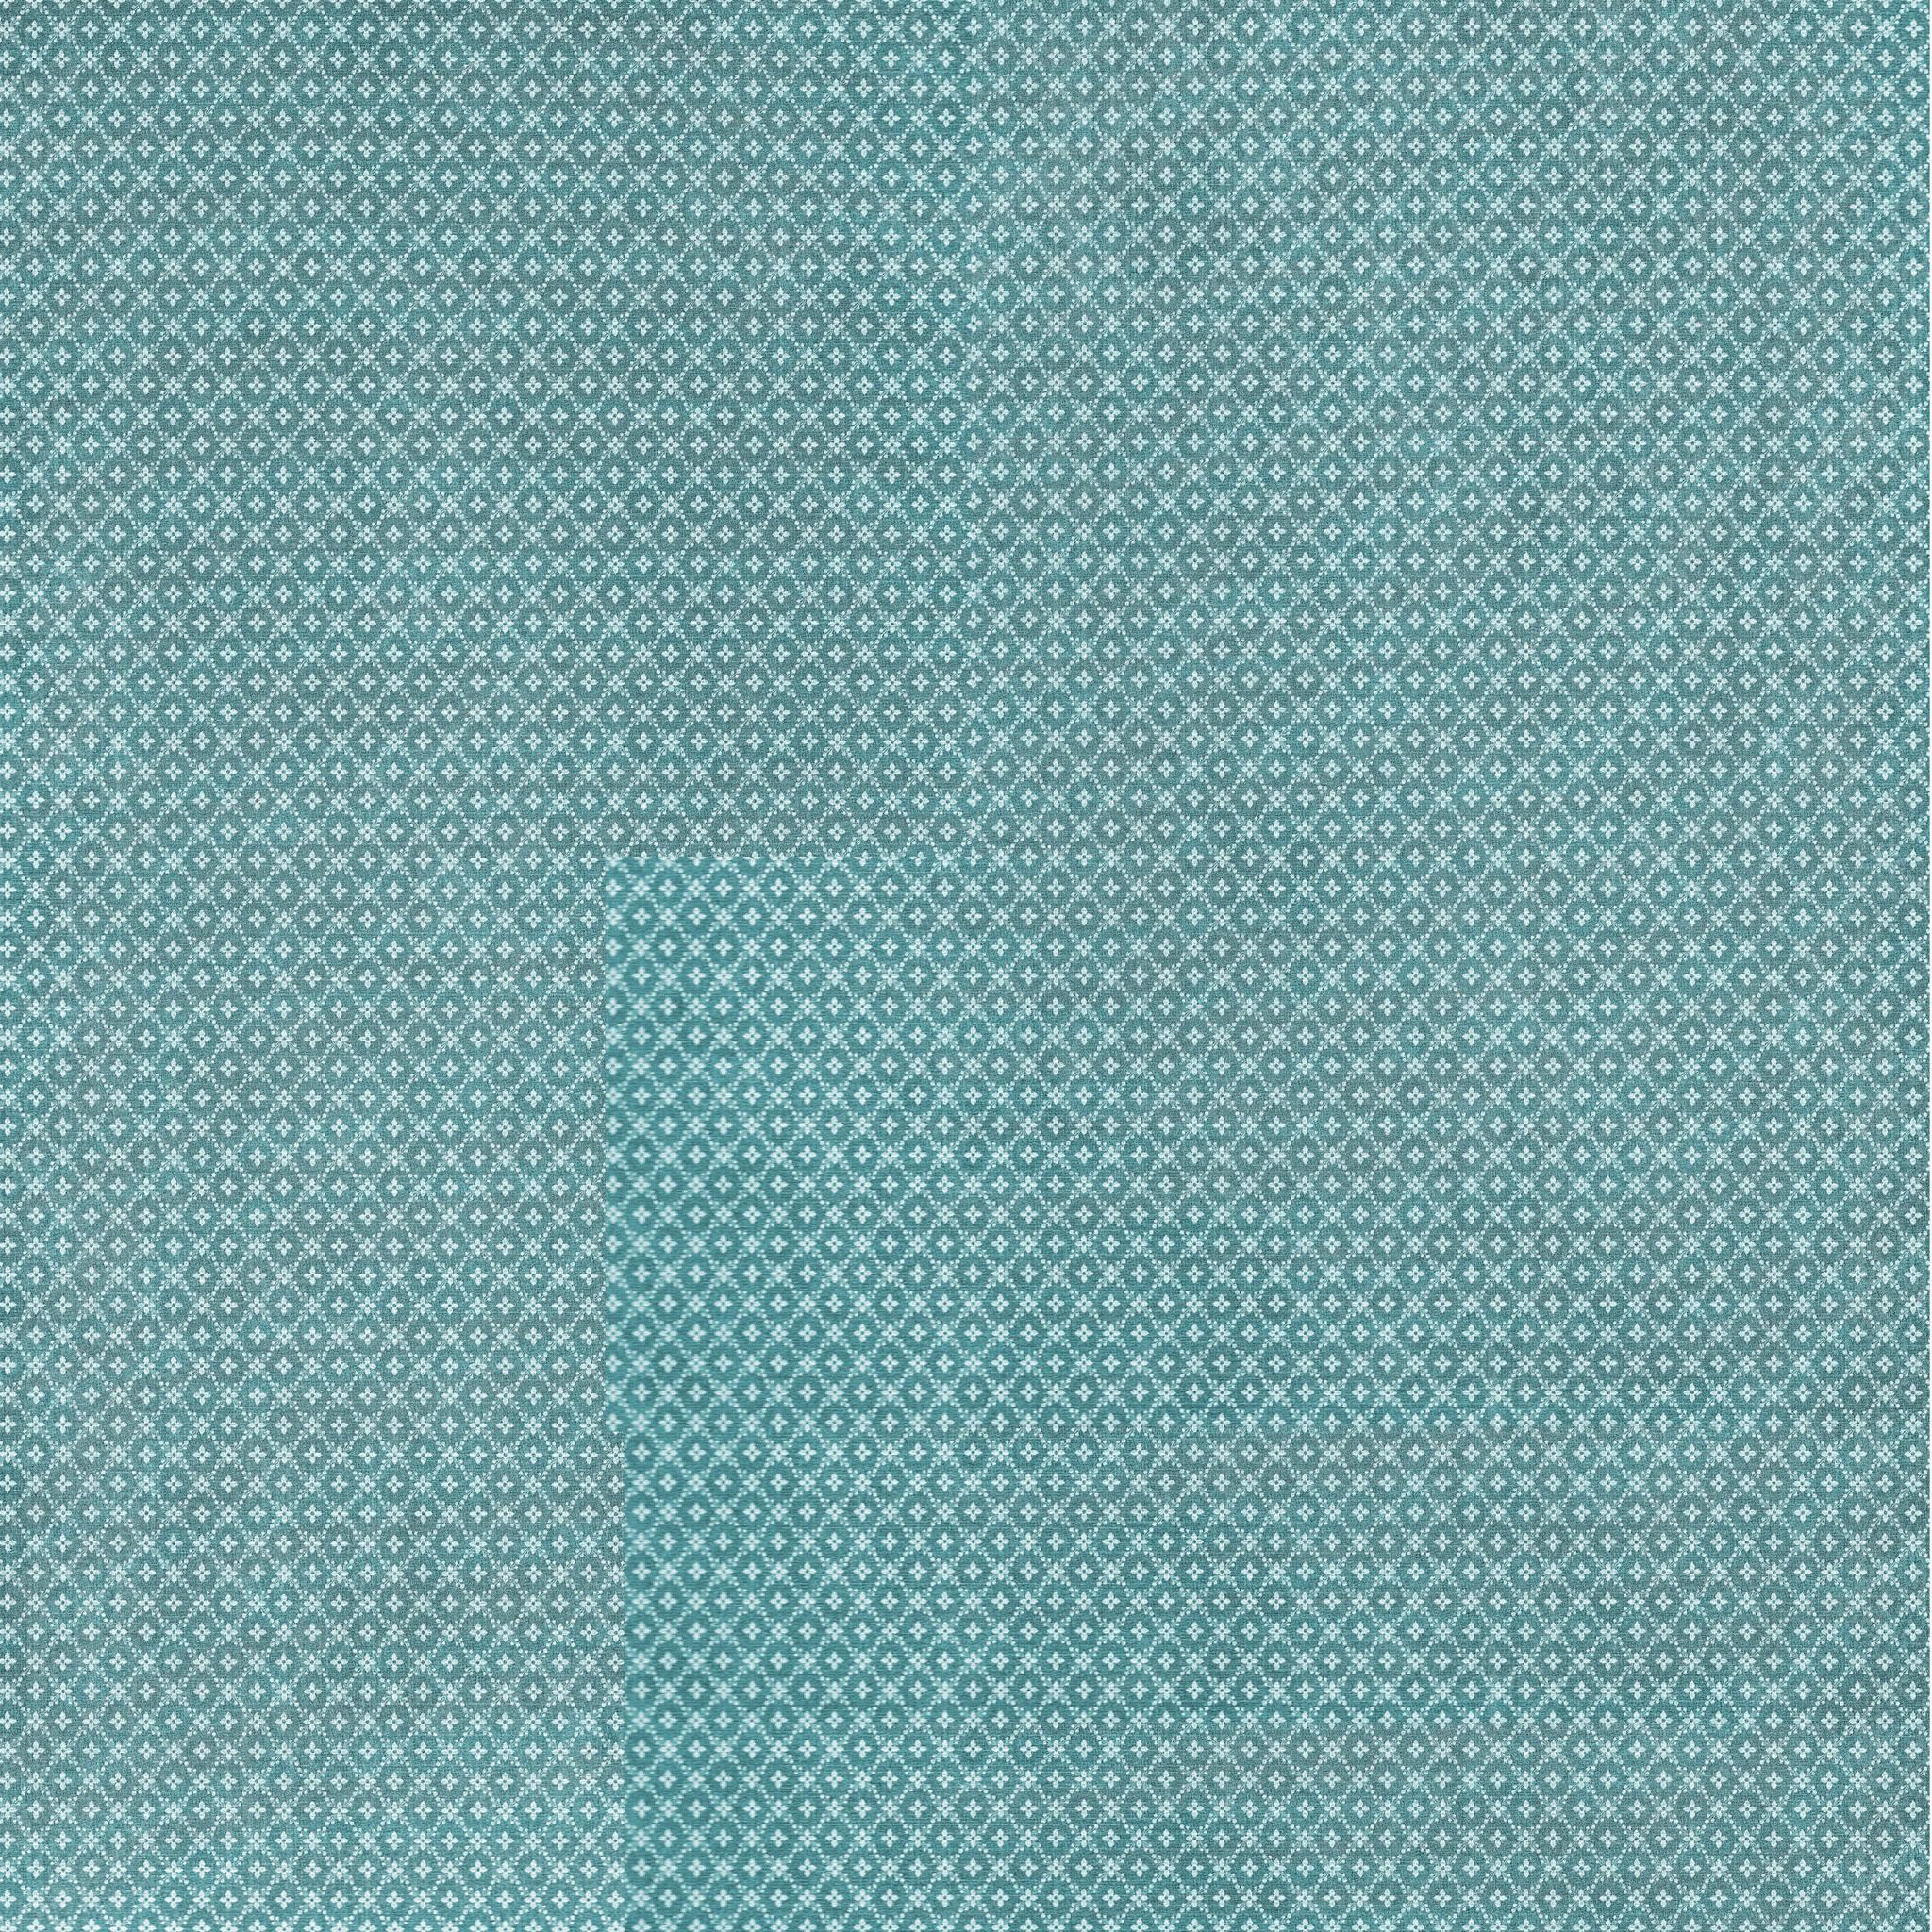 Бумага для скрапбукинга Granny's Quilt Graphic45